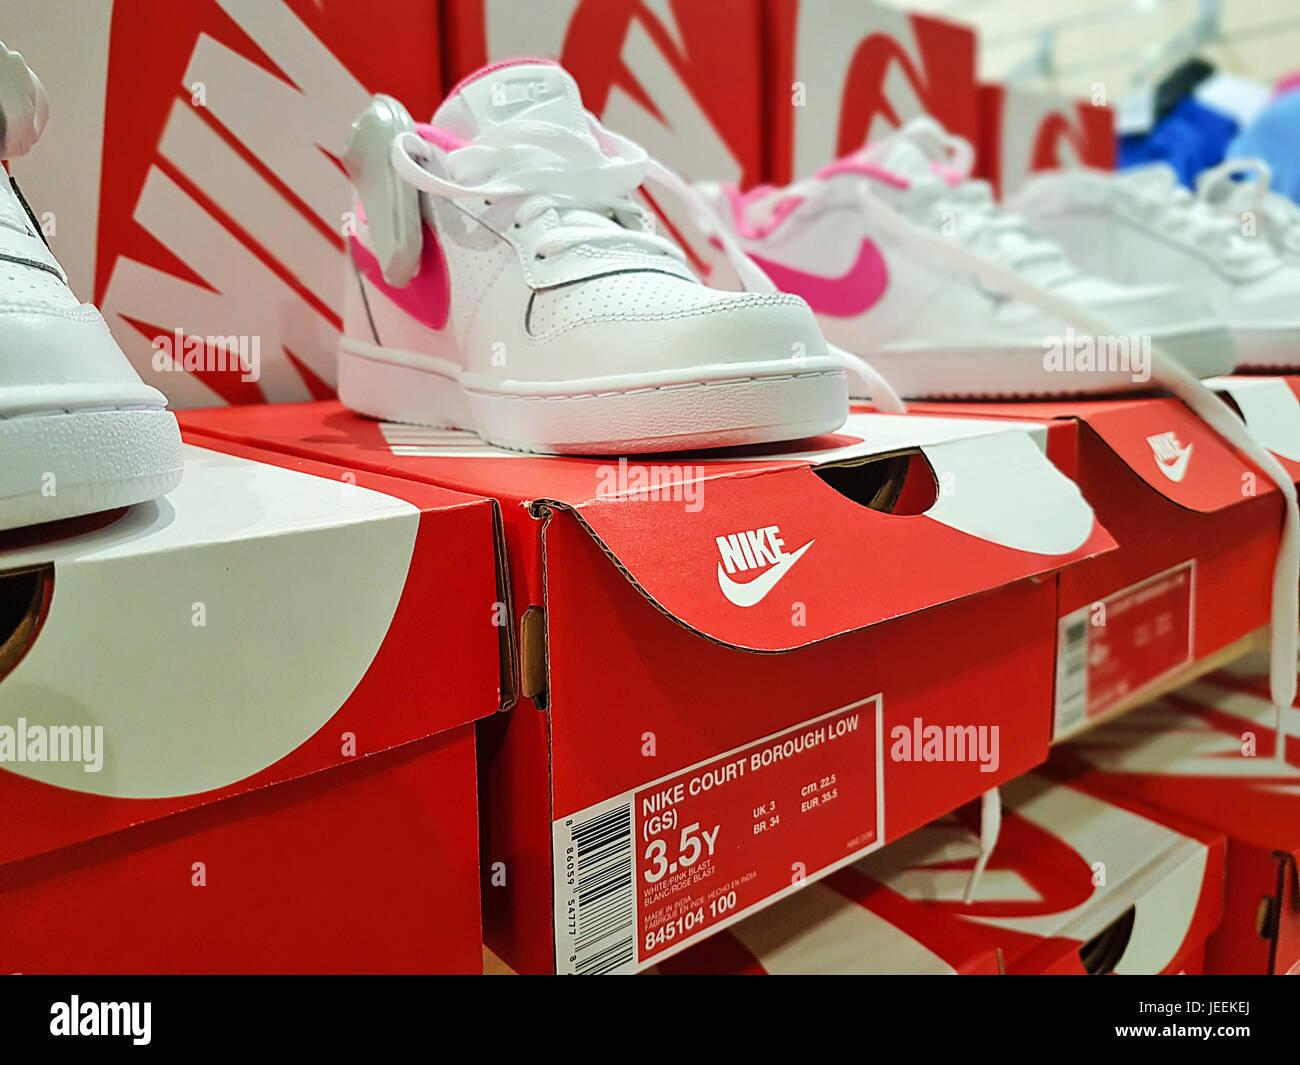 Shop Nike Imágenes De Stock   Shop Nike Fotos De Stock - Alamy 083189b2259f9